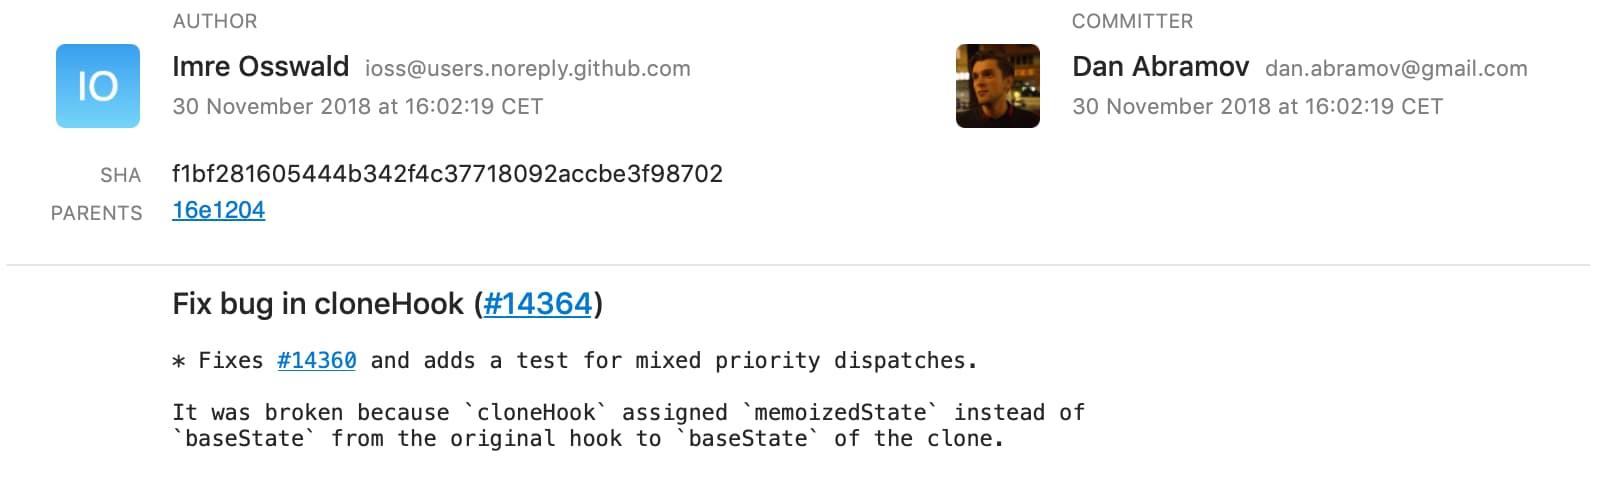 Nom : issue-tracker-hyperlinks.jpg Affichages : 1629 Taille : 41,3 Ko